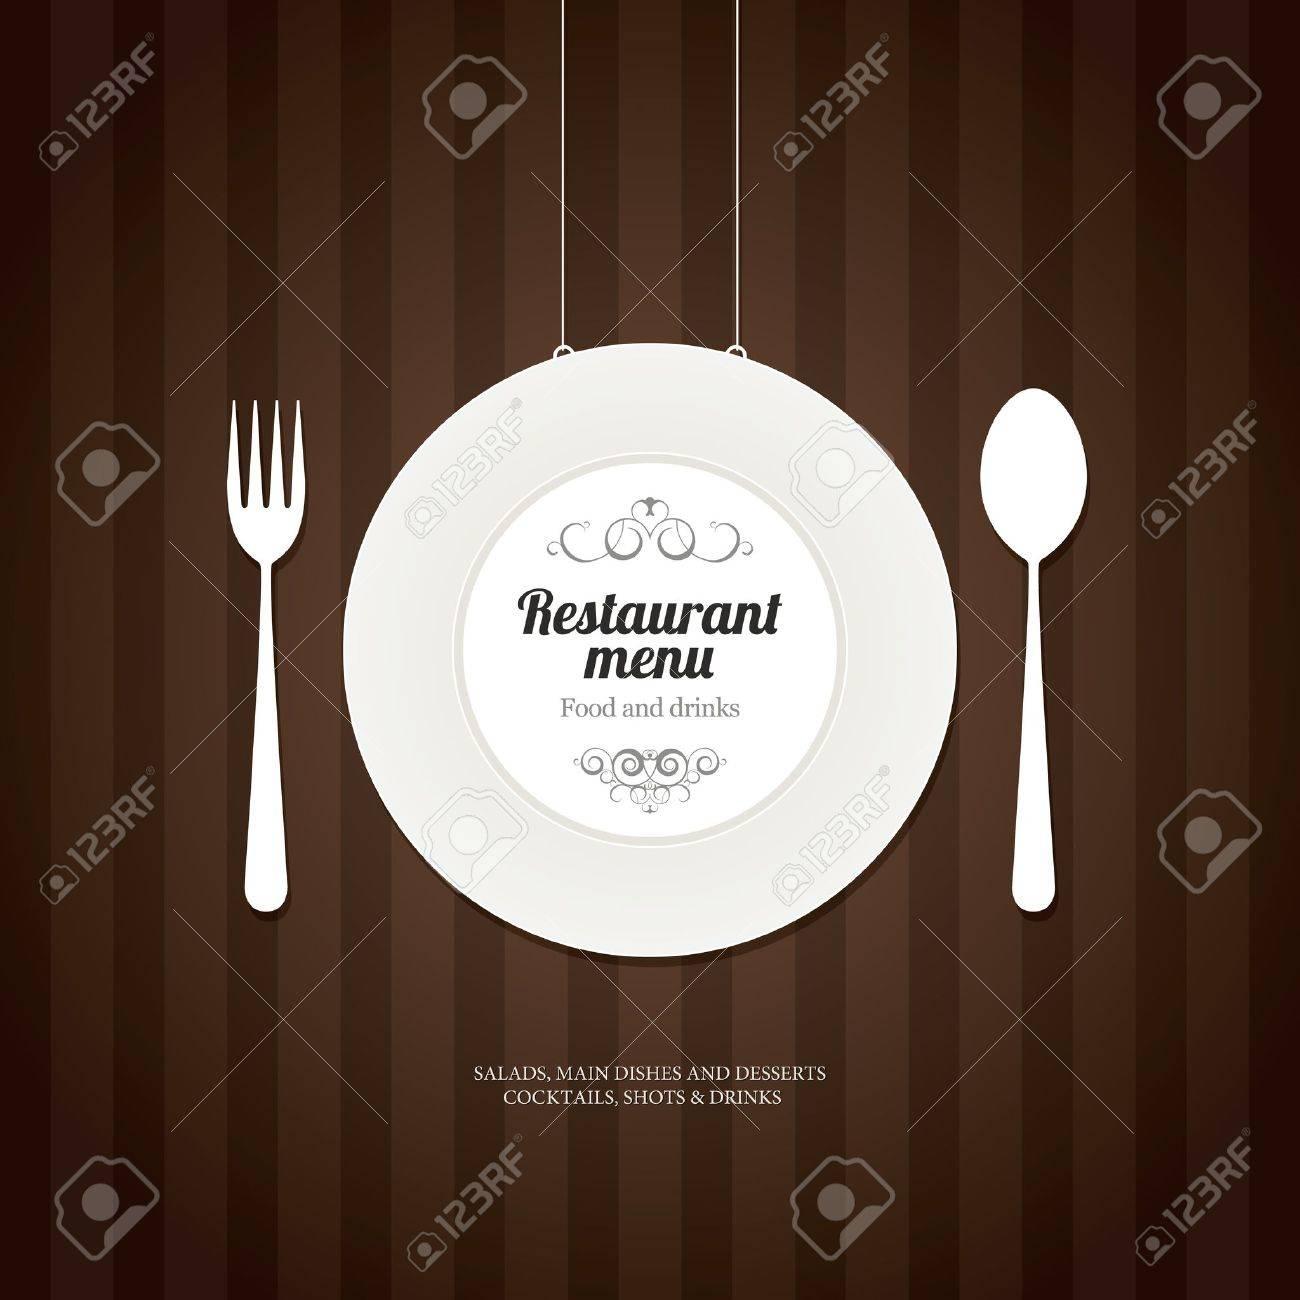 Restaurant menu design Stock Vector - 16666138